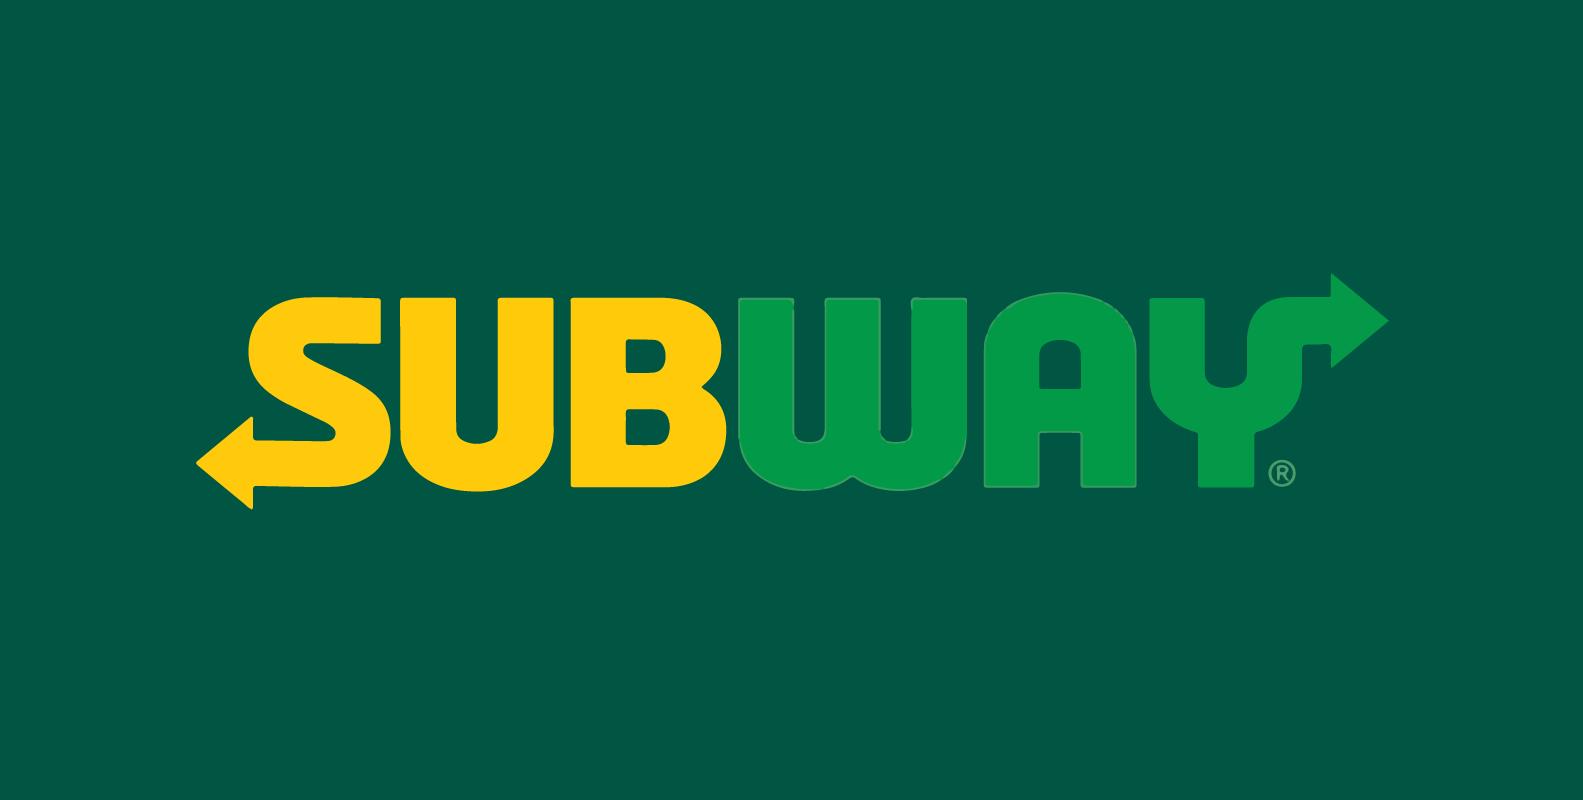 Subway's logo